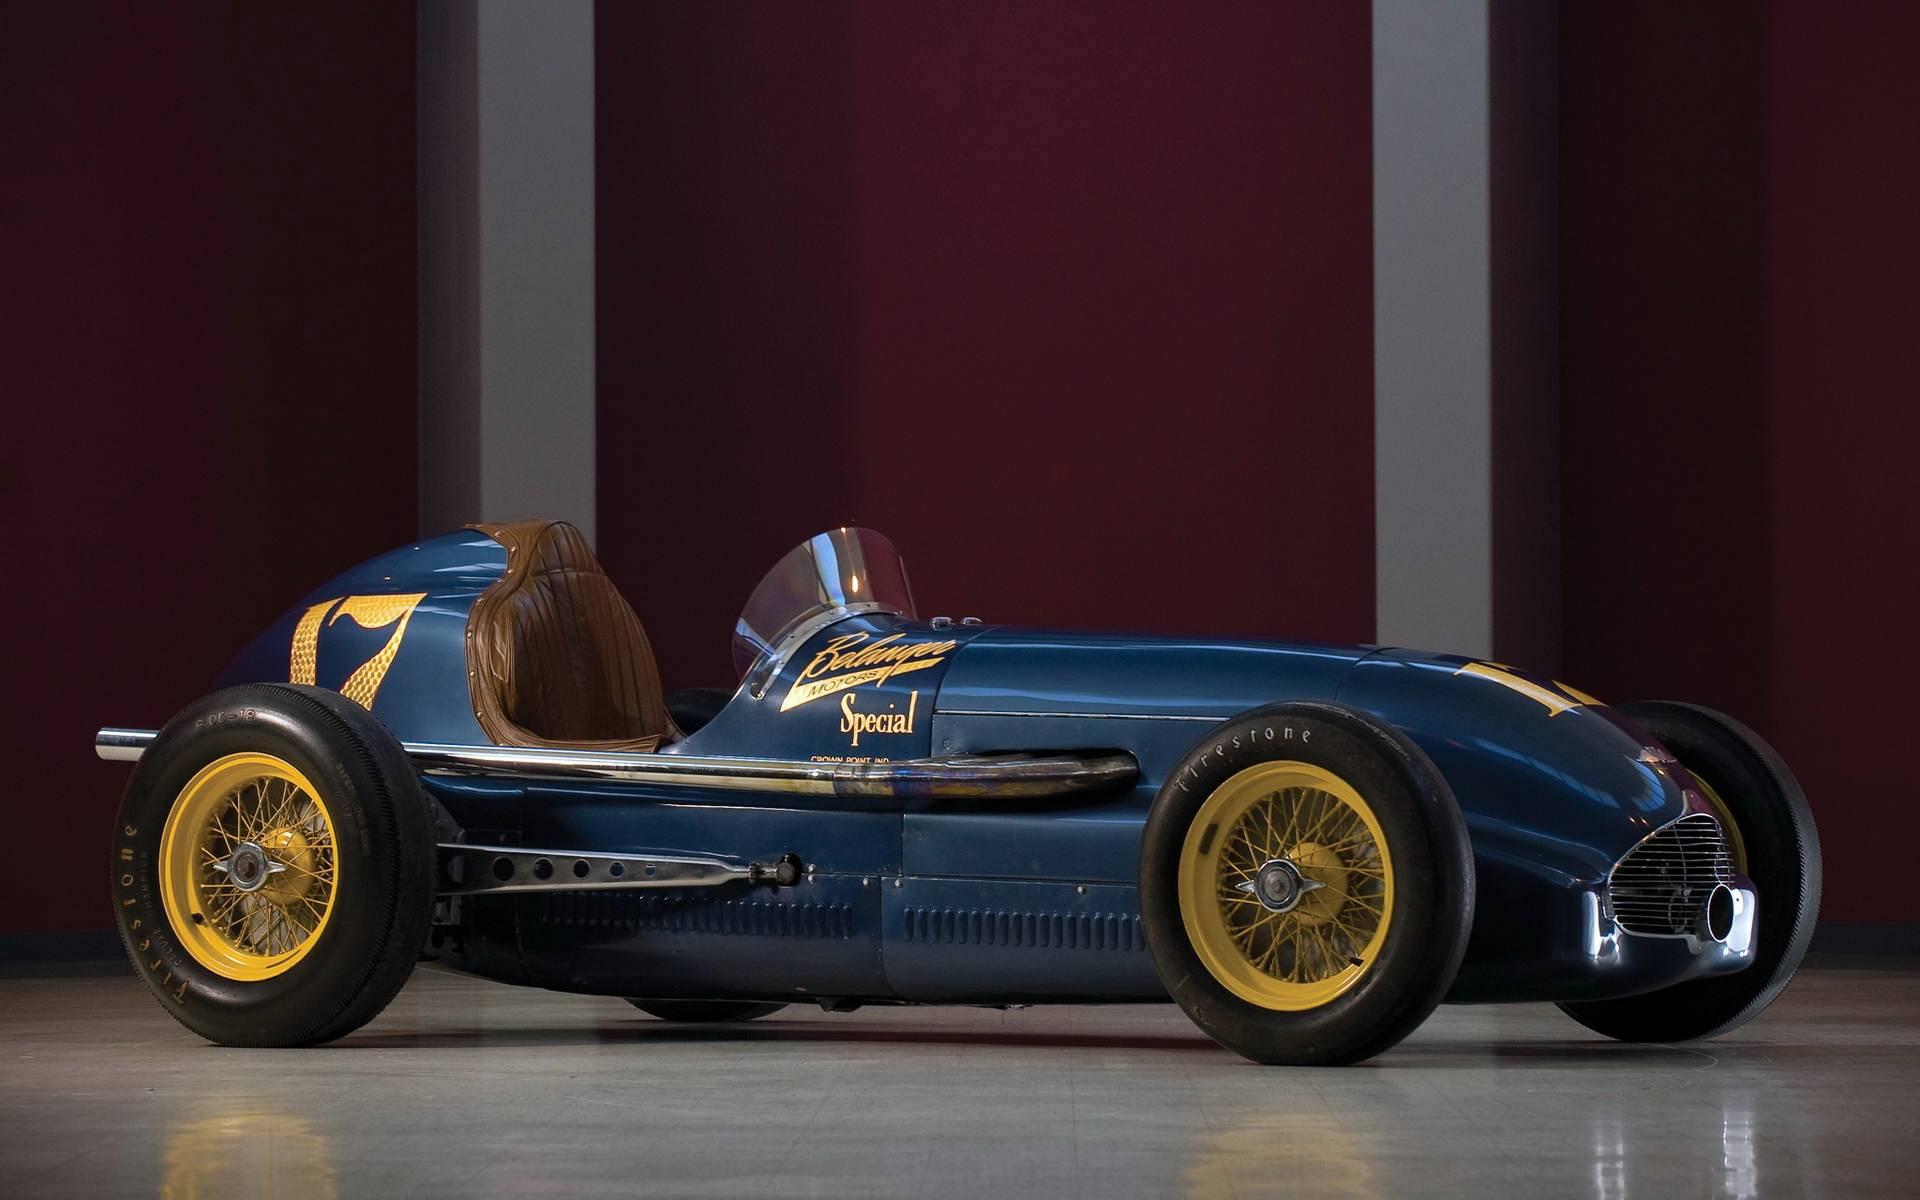 Indy Car Wallpaper Hd Classic Cars Wallpapers